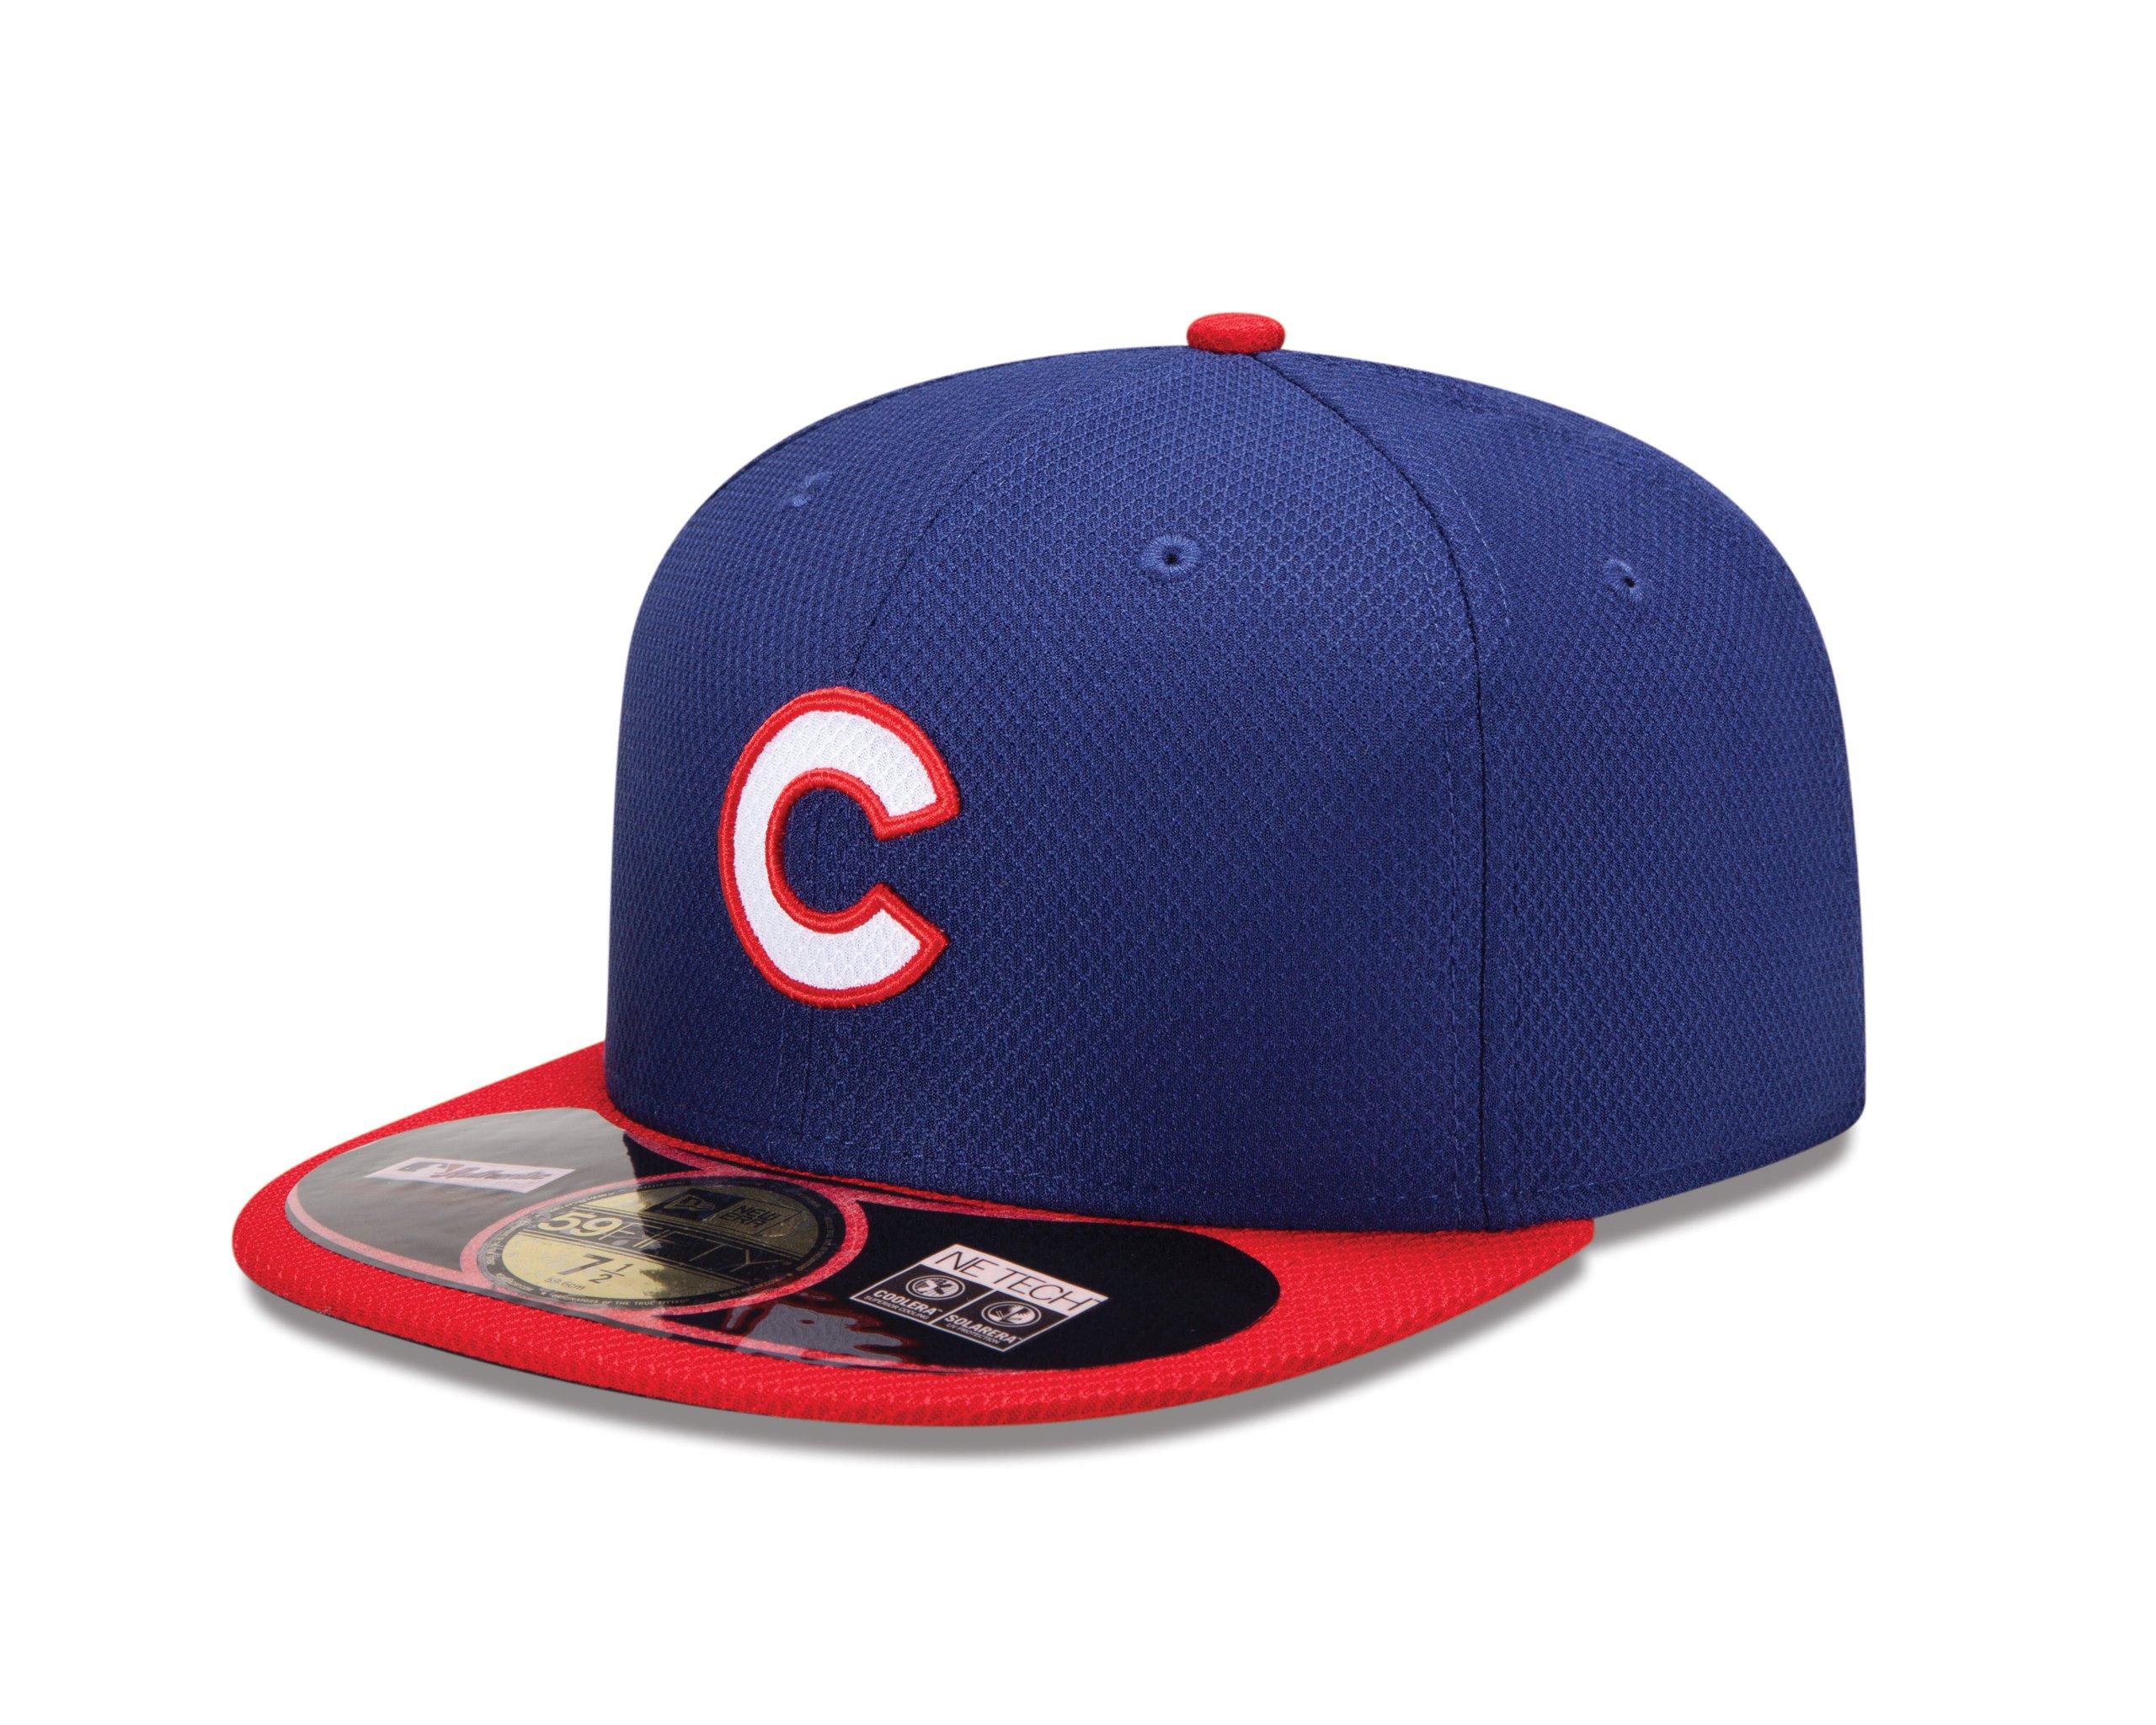 New Era, Cappellino Unisex adulto Diamond Era, Chicago Cubs 59 Fifty, Viola (Team), 55,8 cm